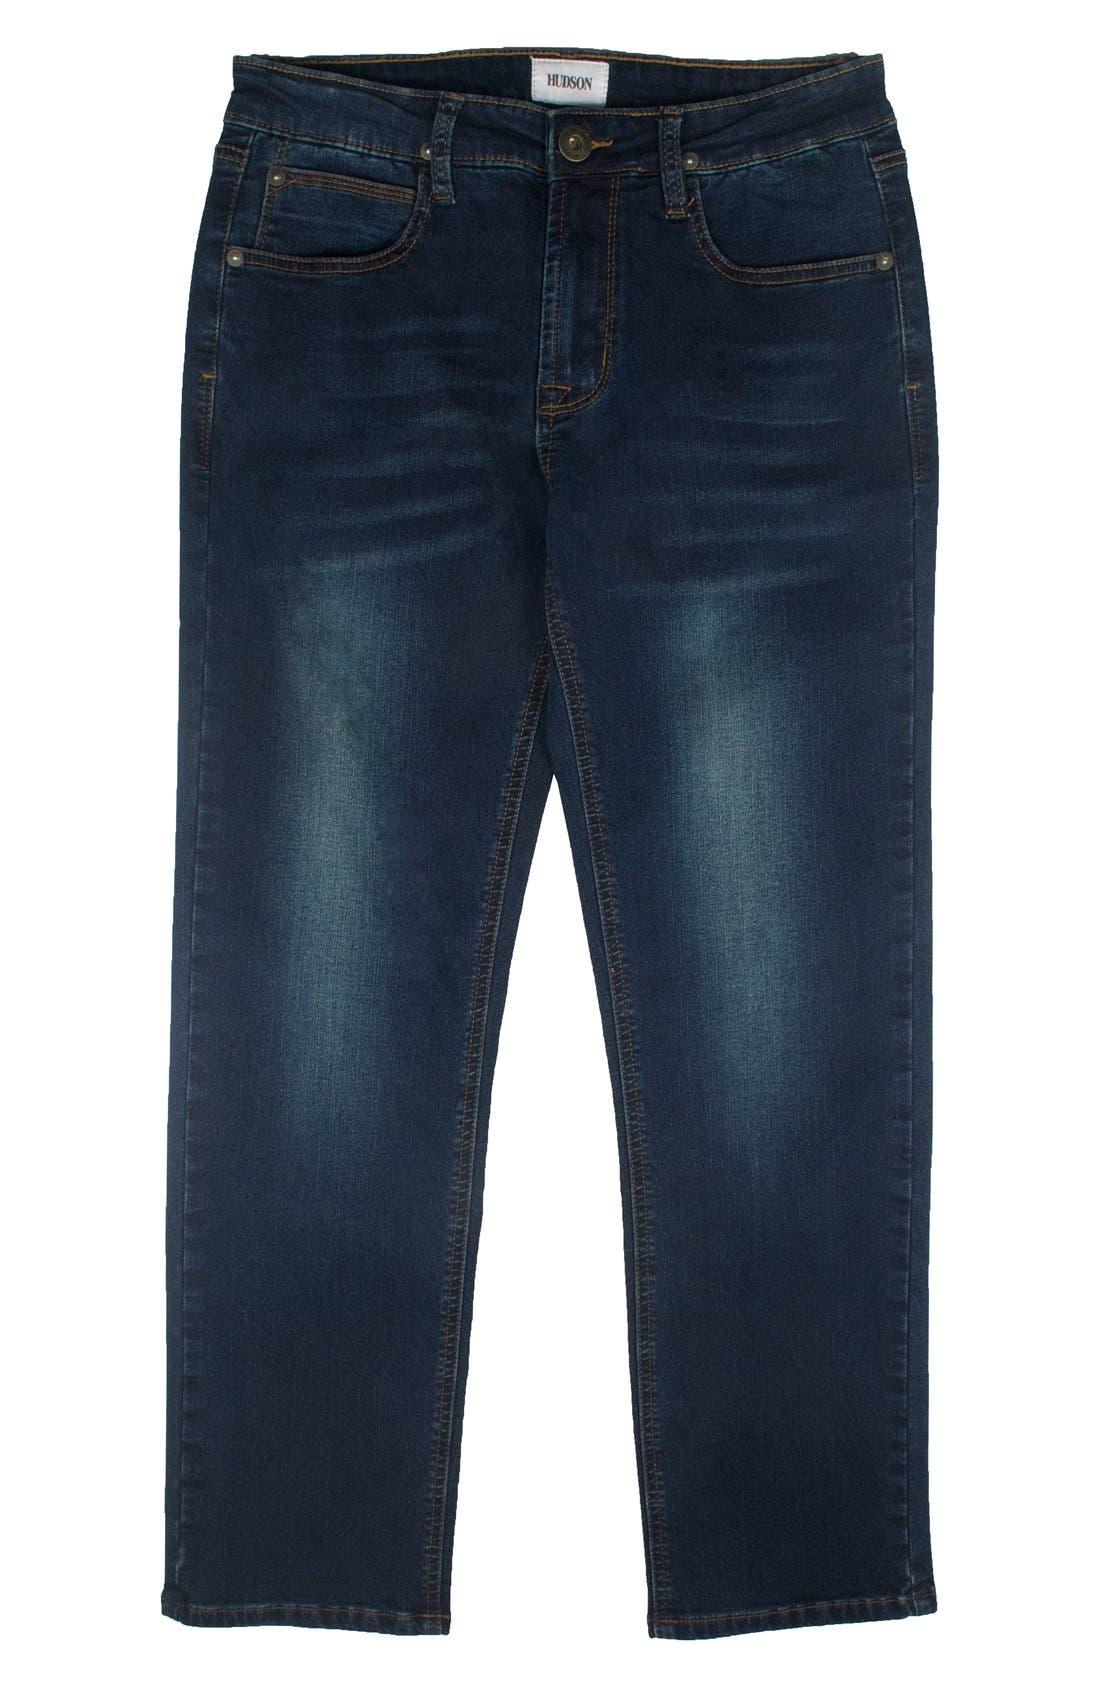 Jagger Straight Leg Jeans,                             Main thumbnail 1, color,                             426